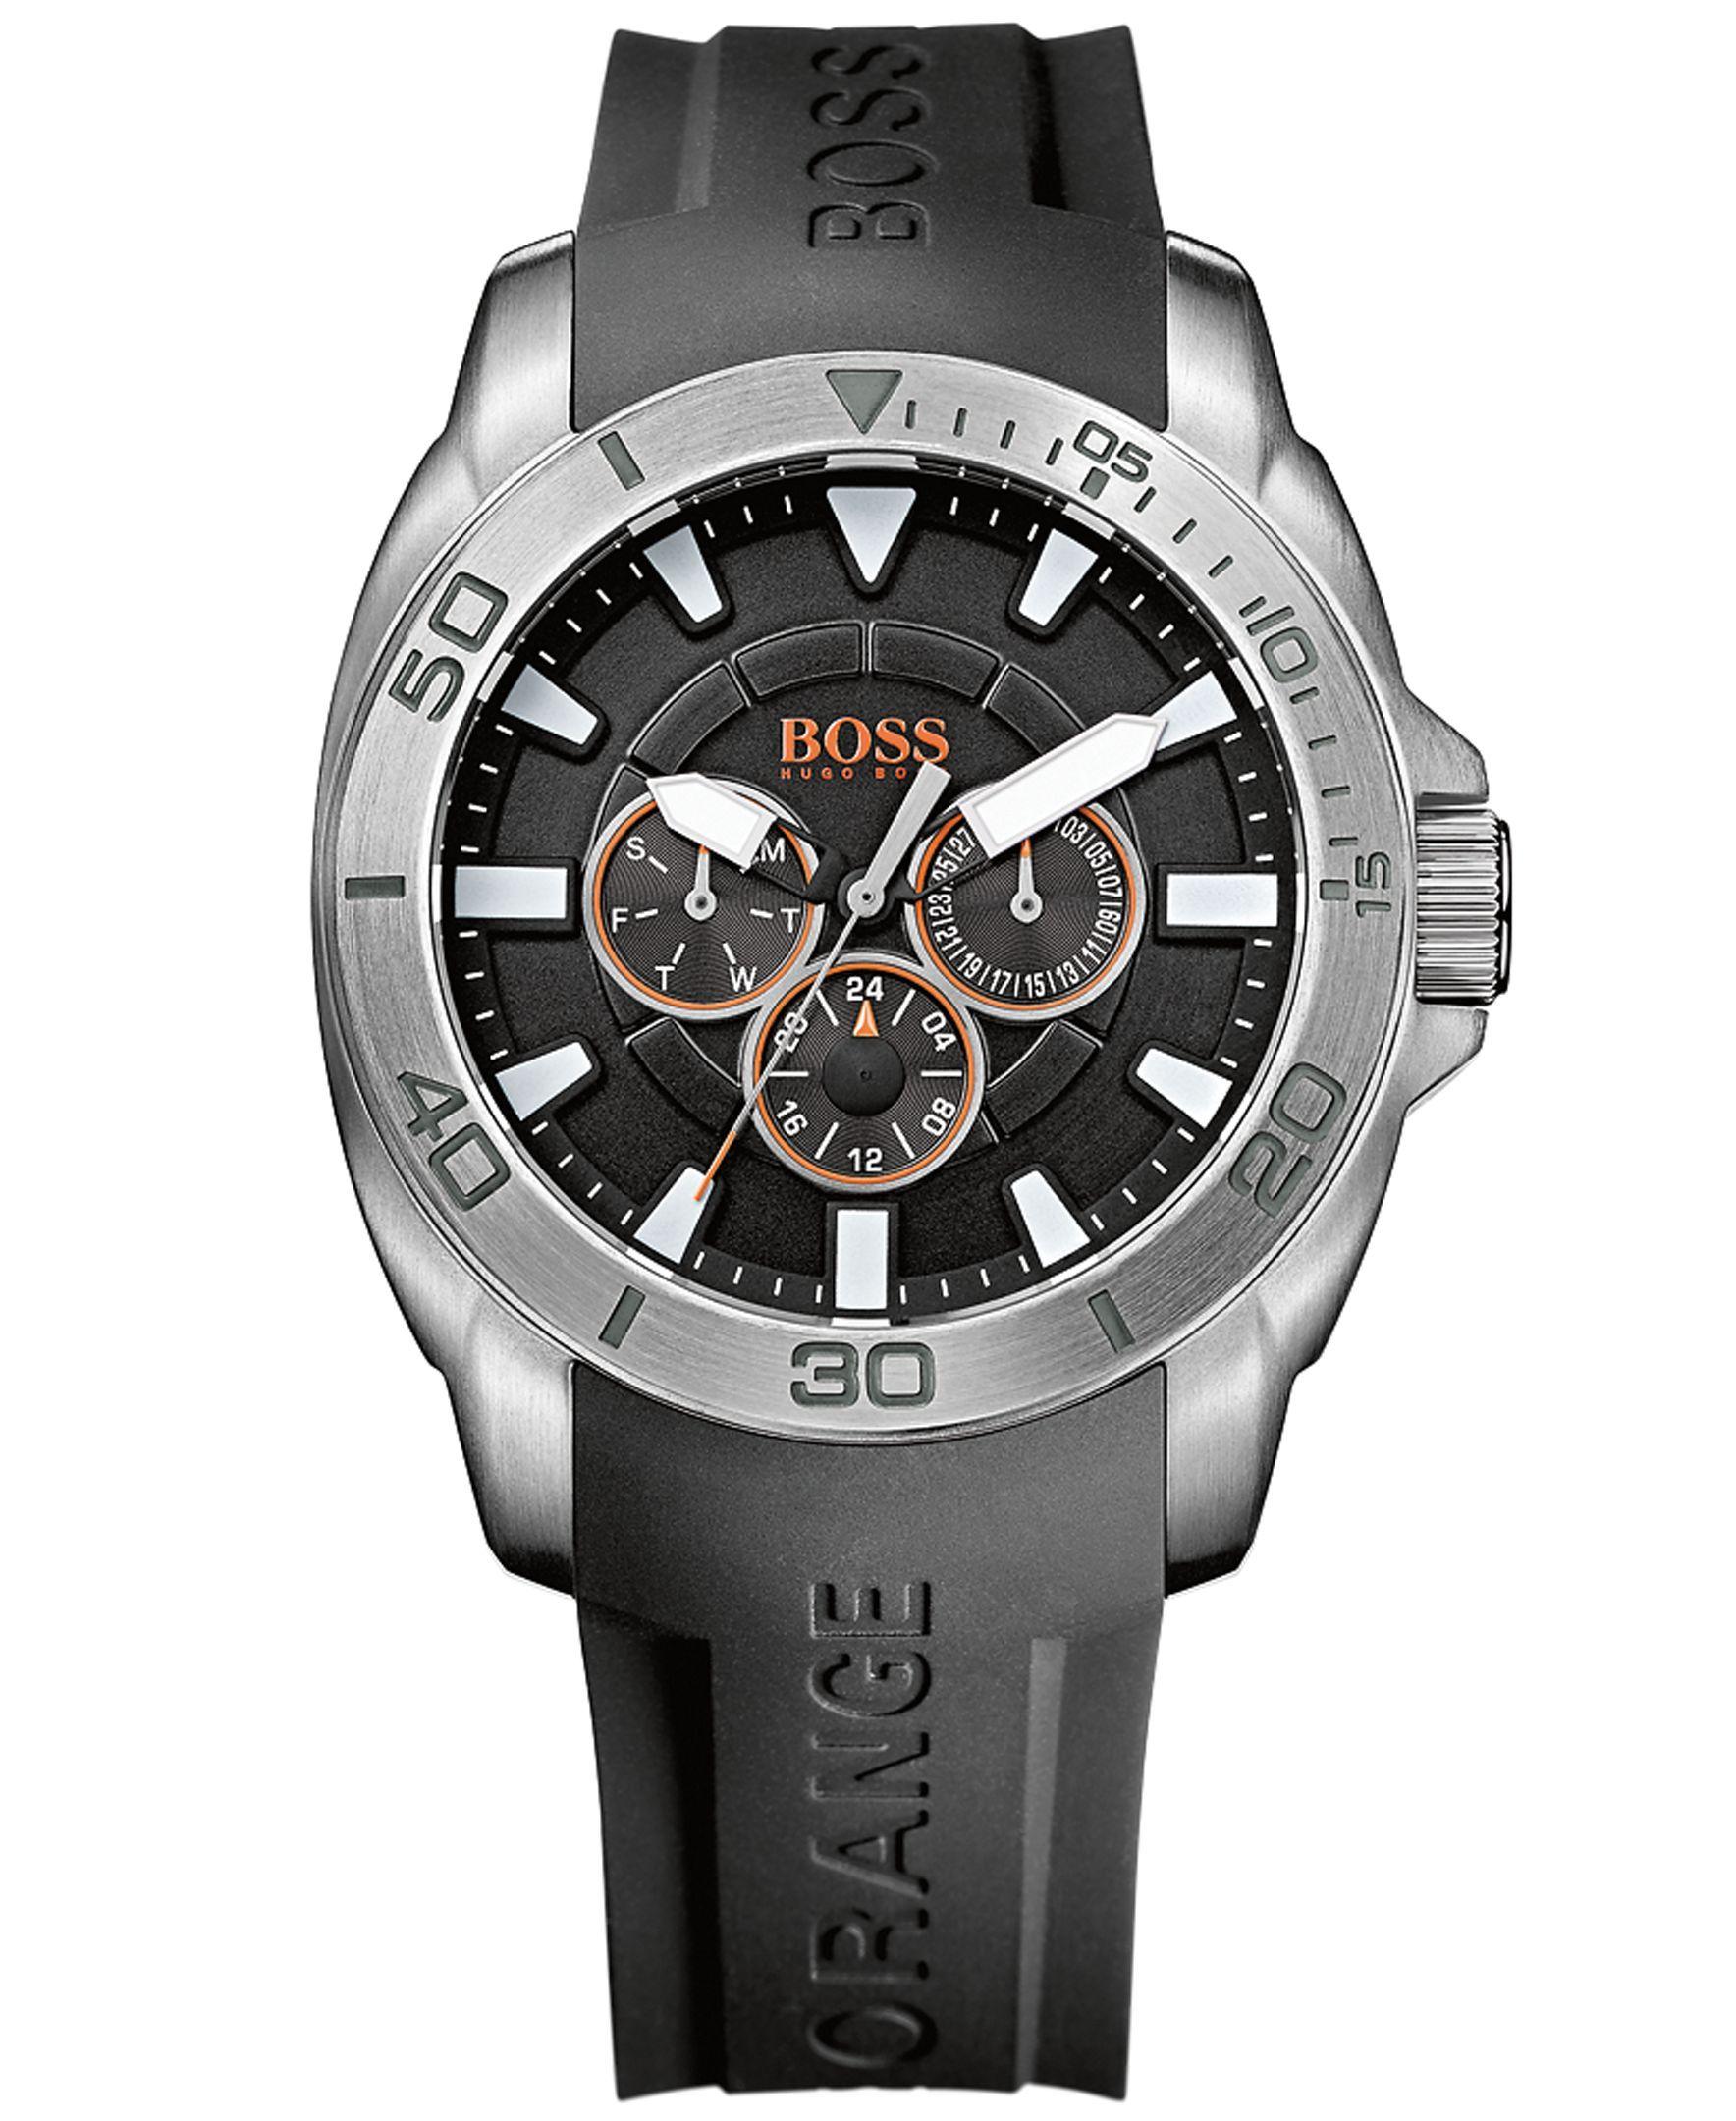 5411a72aa Hugo Boss Men's Boss Orange Black Silicone Strap Watch 45mm 512950 ...